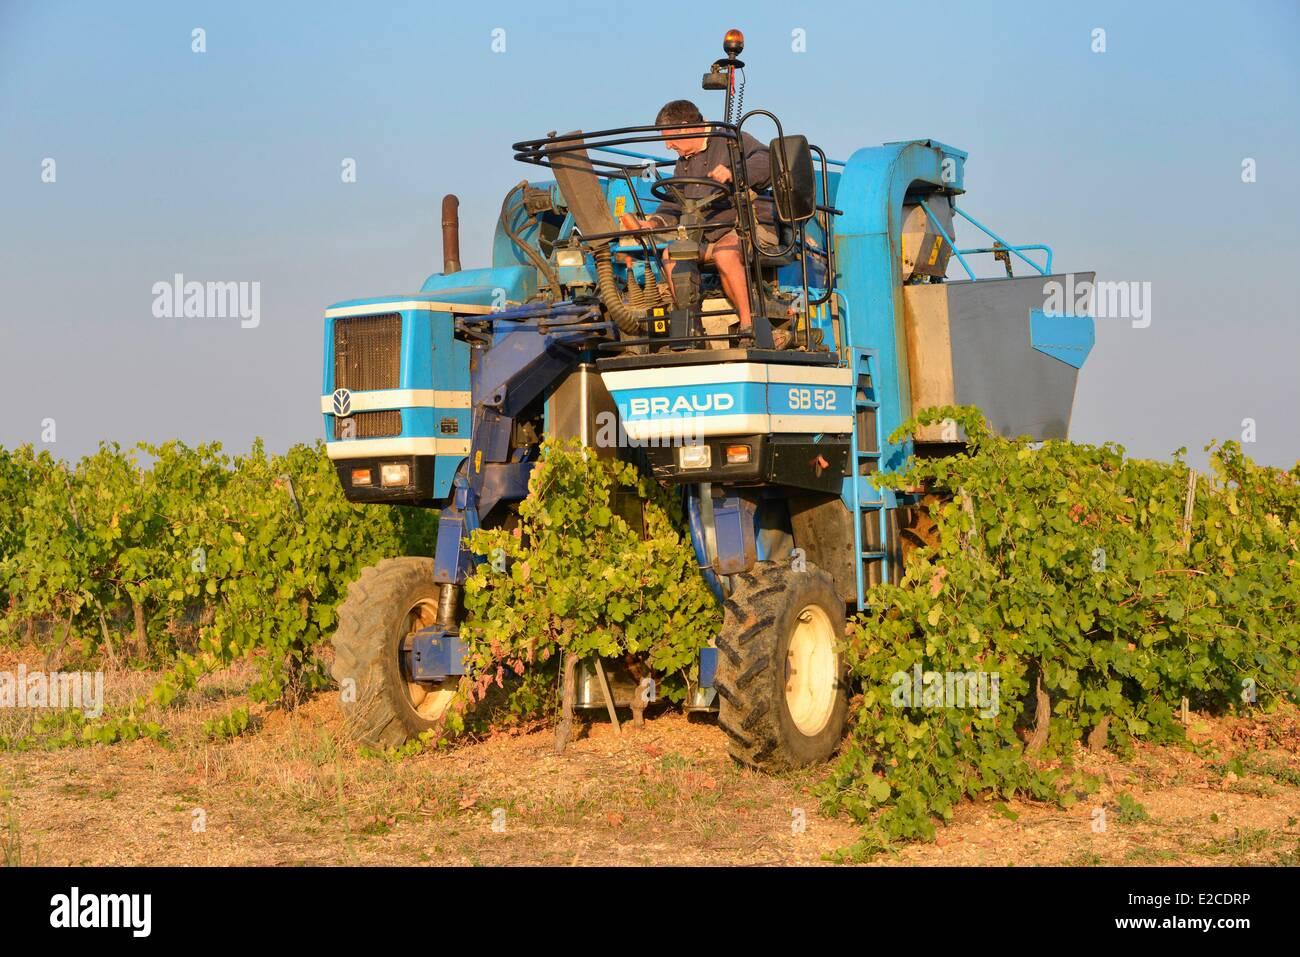 Frankreich, Herault, Boujan Sur Libron, Domain Haute Condamine, Weinberge des Languedoc, Traube harvester Stockbild